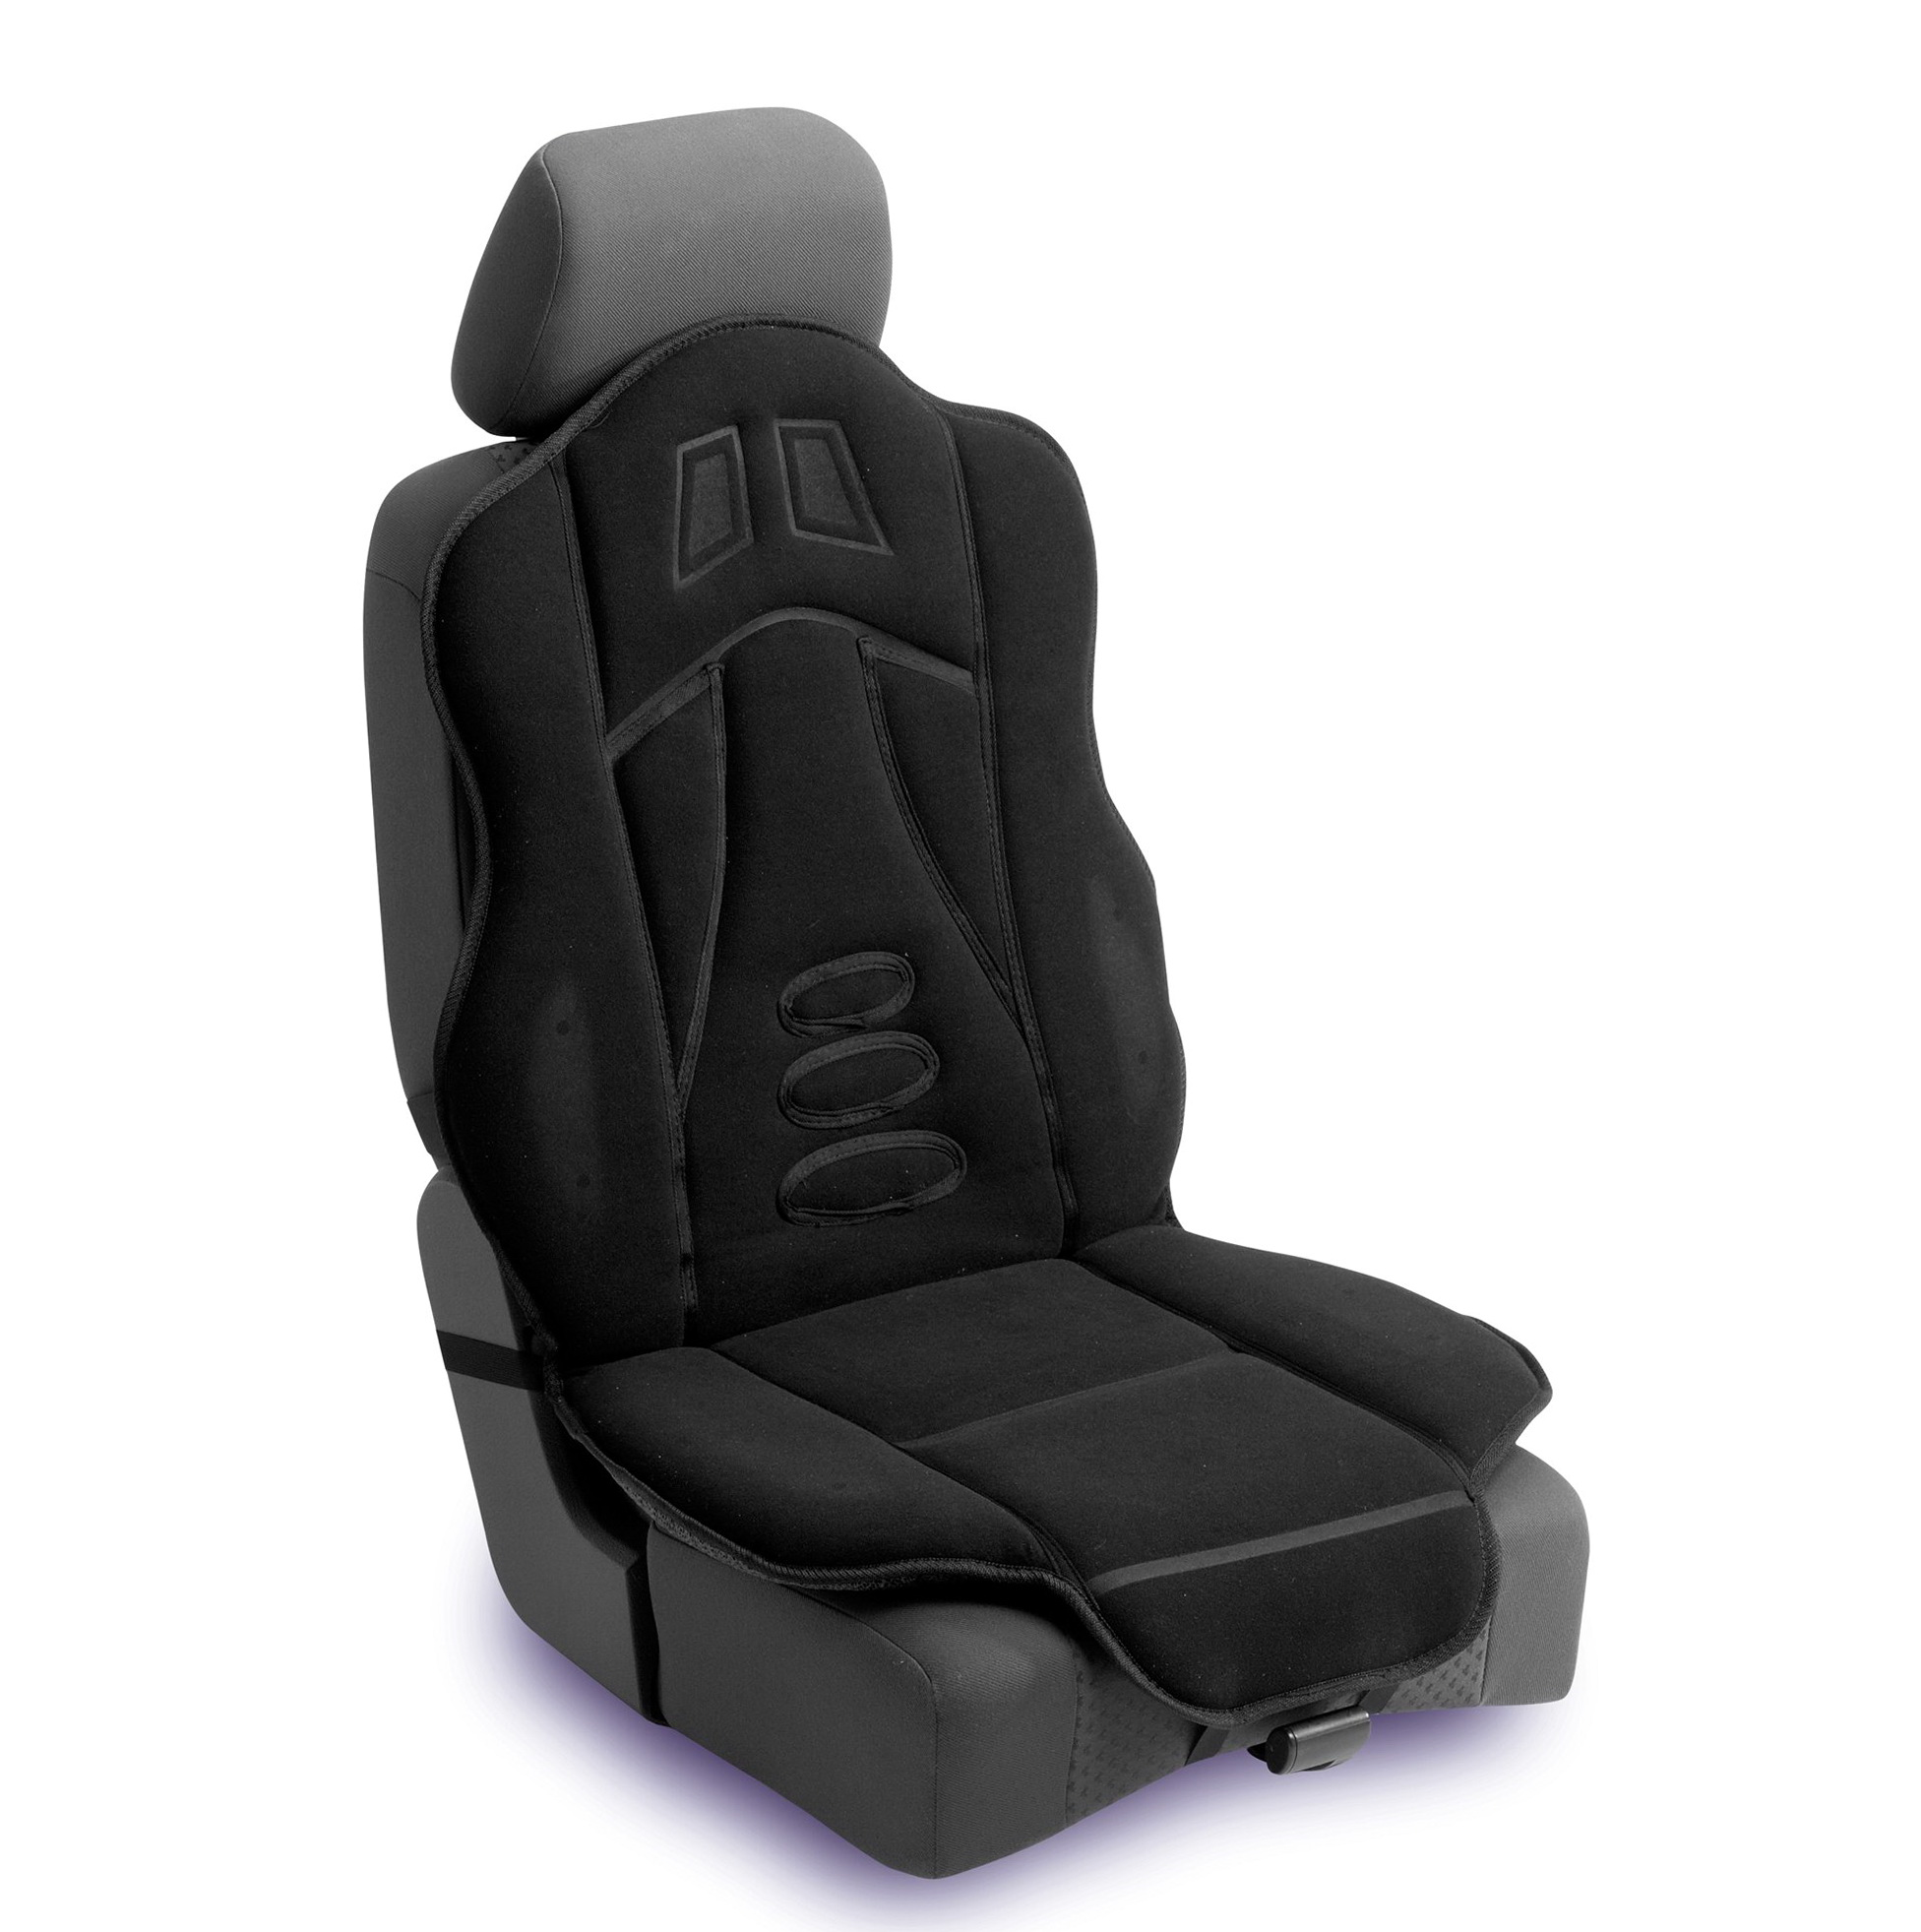 sciatica seat cushion car home design ideas. Black Bedroom Furniture Sets. Home Design Ideas